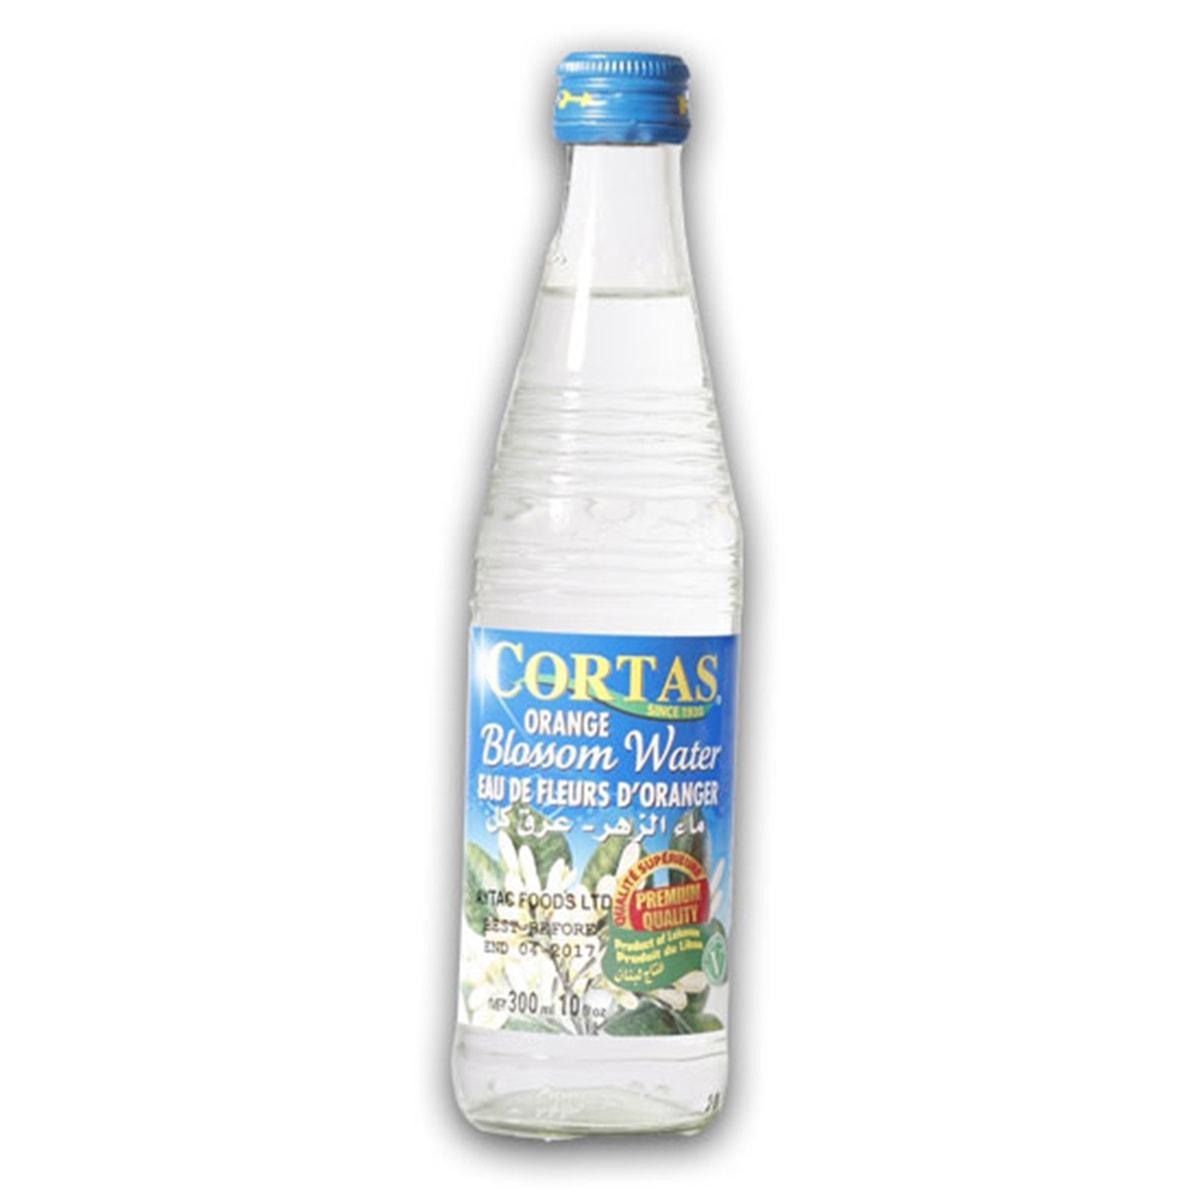 Buy Cortas Orange Blossom Water - 300 ml